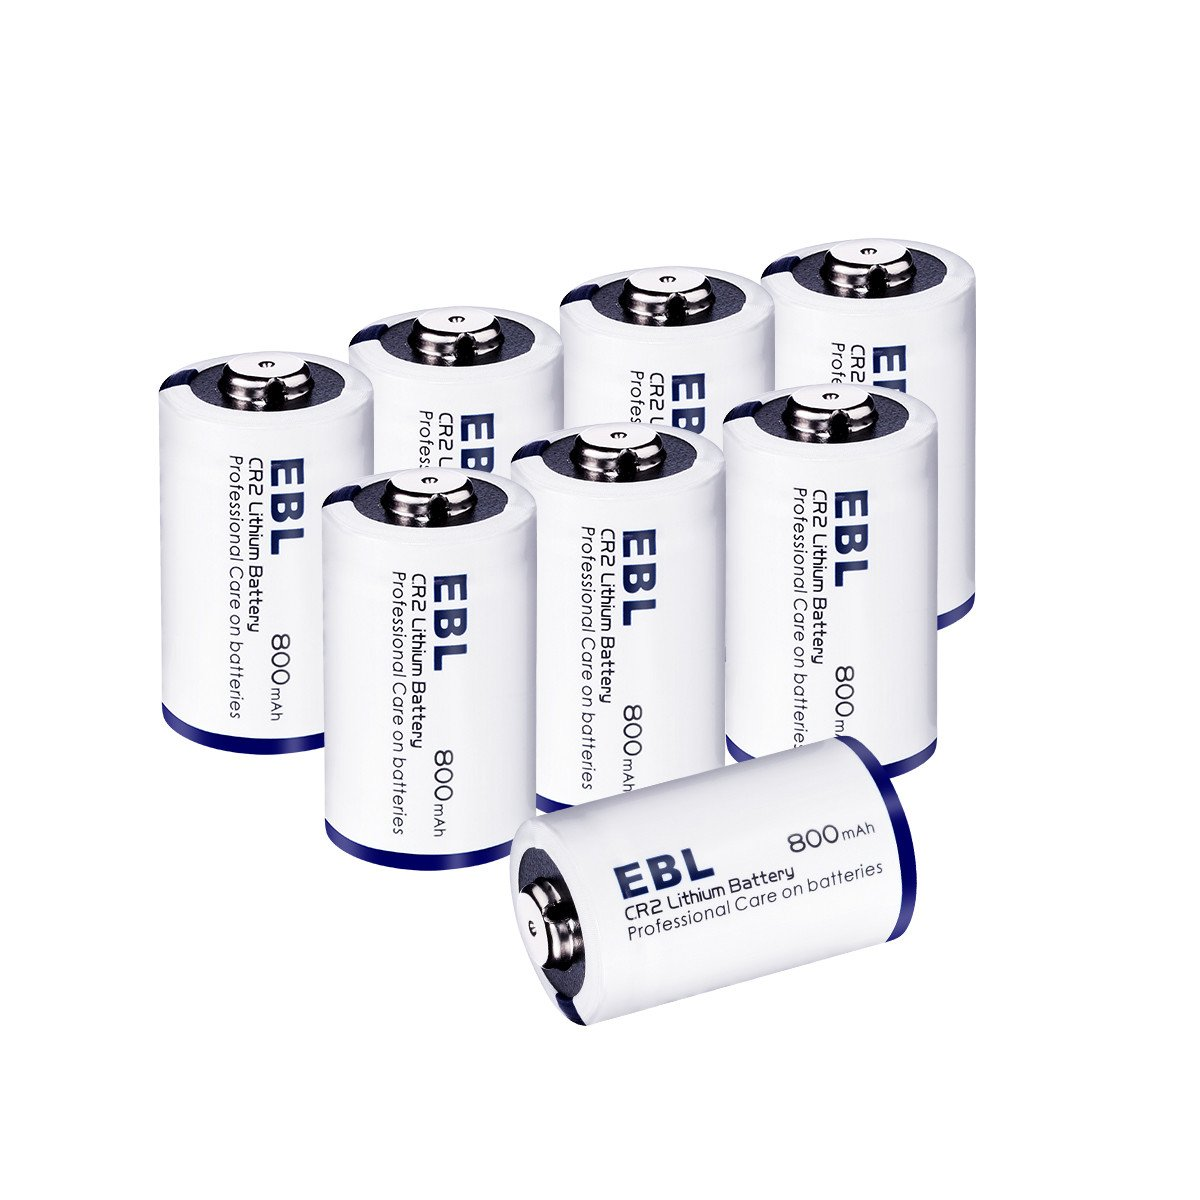 EBL CR2 Lithium Battery, 3 Volt Photo Battery for Mini 25, Mini 50, Golf Rangefinder, Flashlight, Electronic Toys, Alarm Systems - 8 Pack